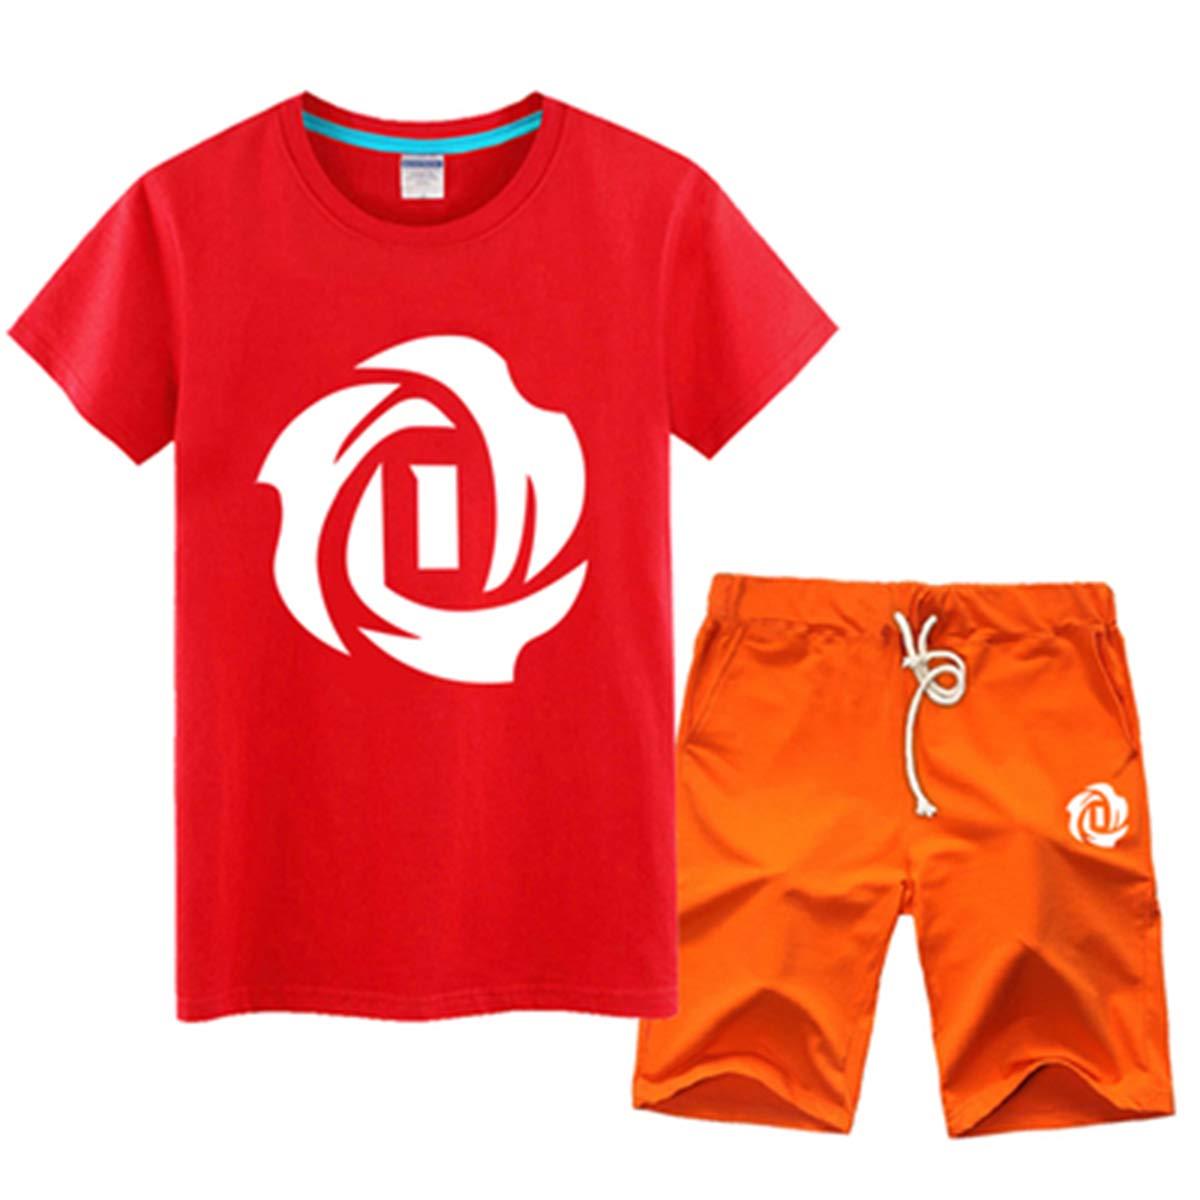 Camiseta De Baloncesto De La NBA Hombre Conjunto De Manga Corta ...